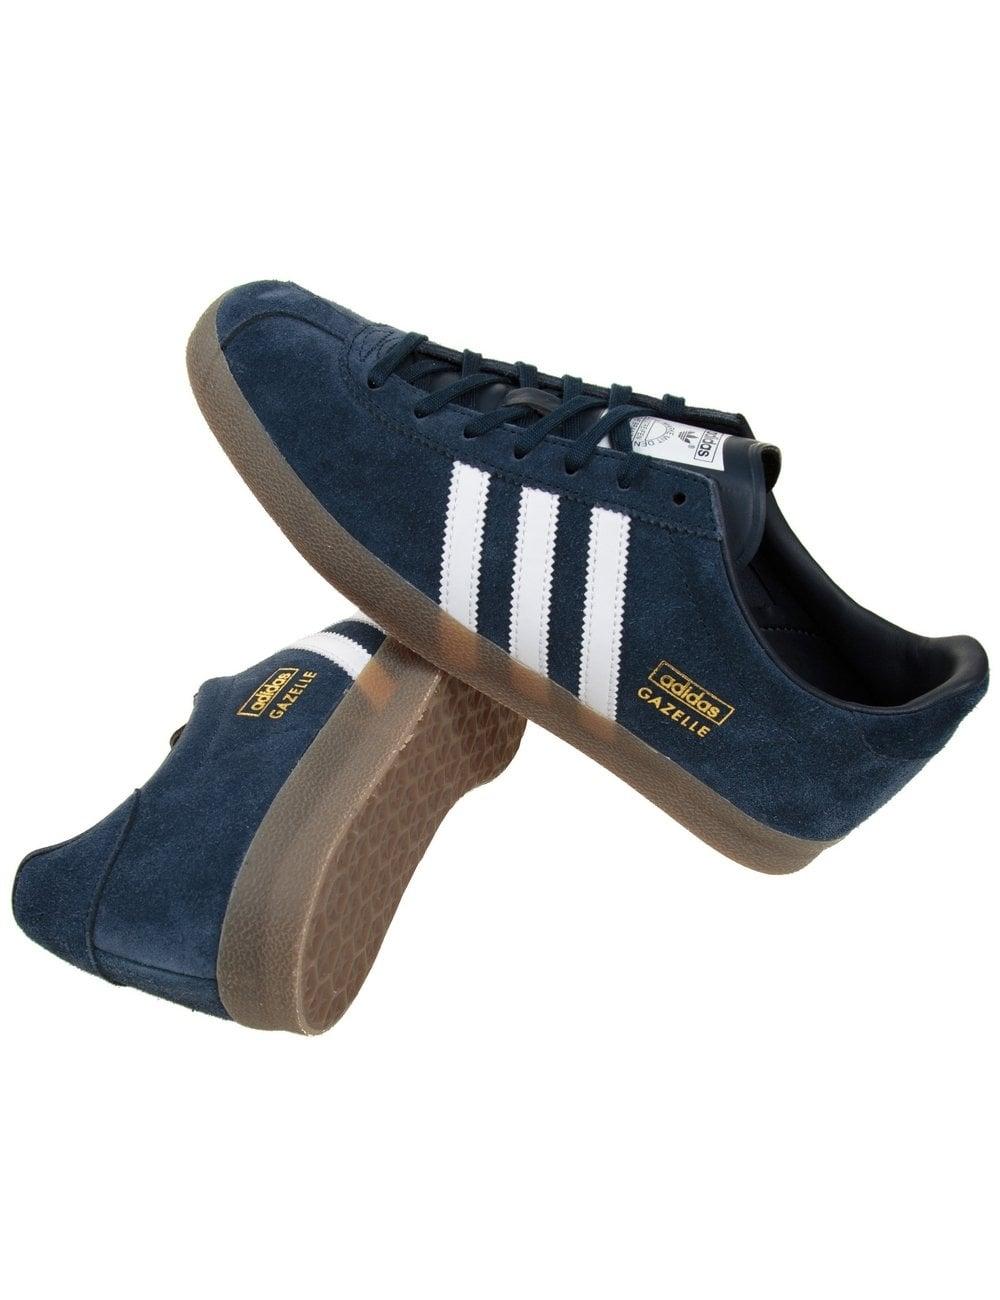 transmitir binario guirnalda  Adidas Originals Gazelle OG - Collegiate Navy - Footwear from Fat Buddha  Store UK